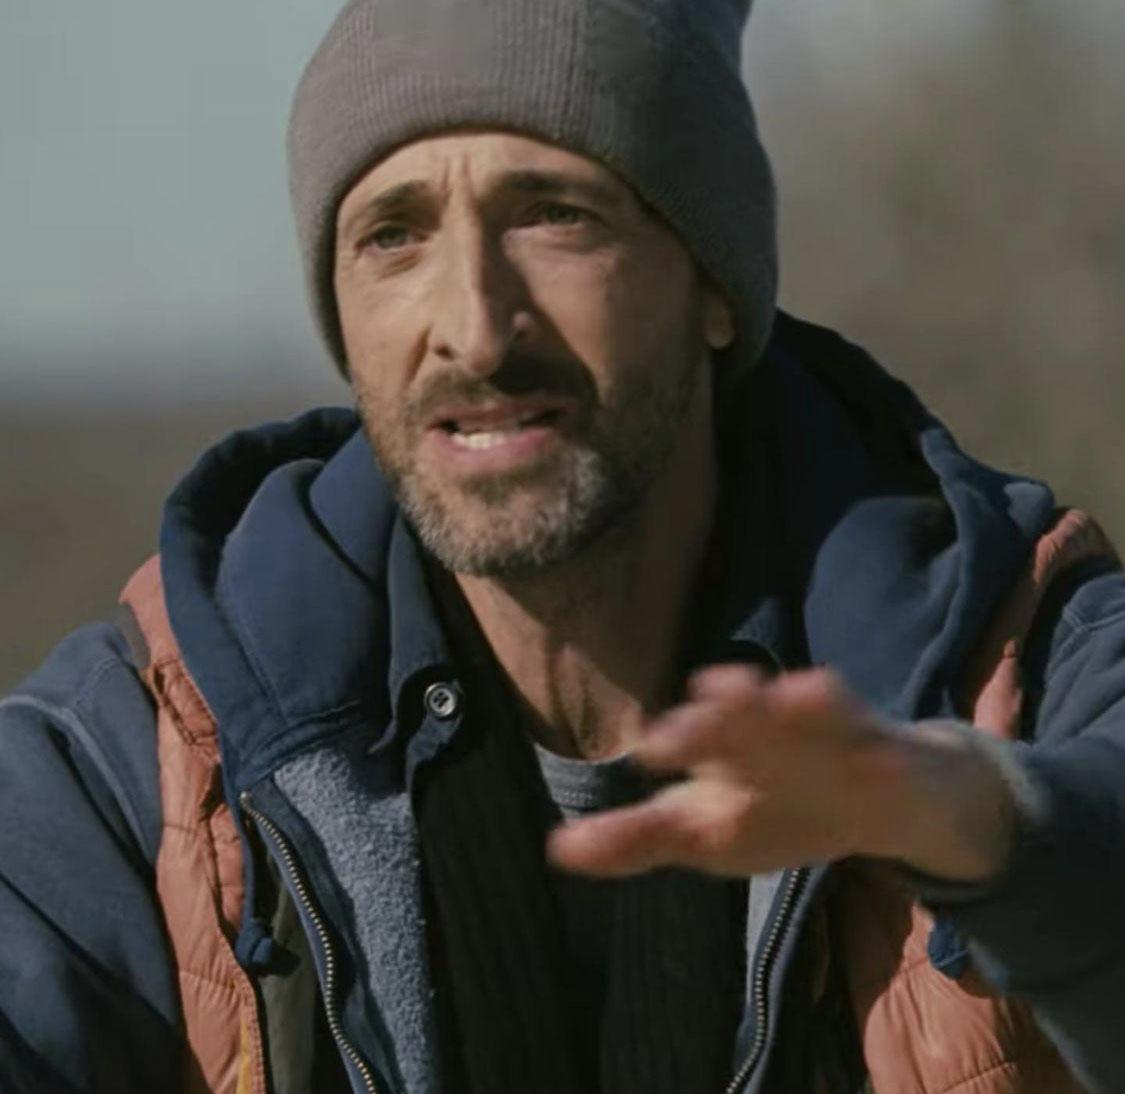 Adrien Brody som Josh Aaronson i Succession sesong 3 (HB Nordic - eller rettere sagt HBO Max)